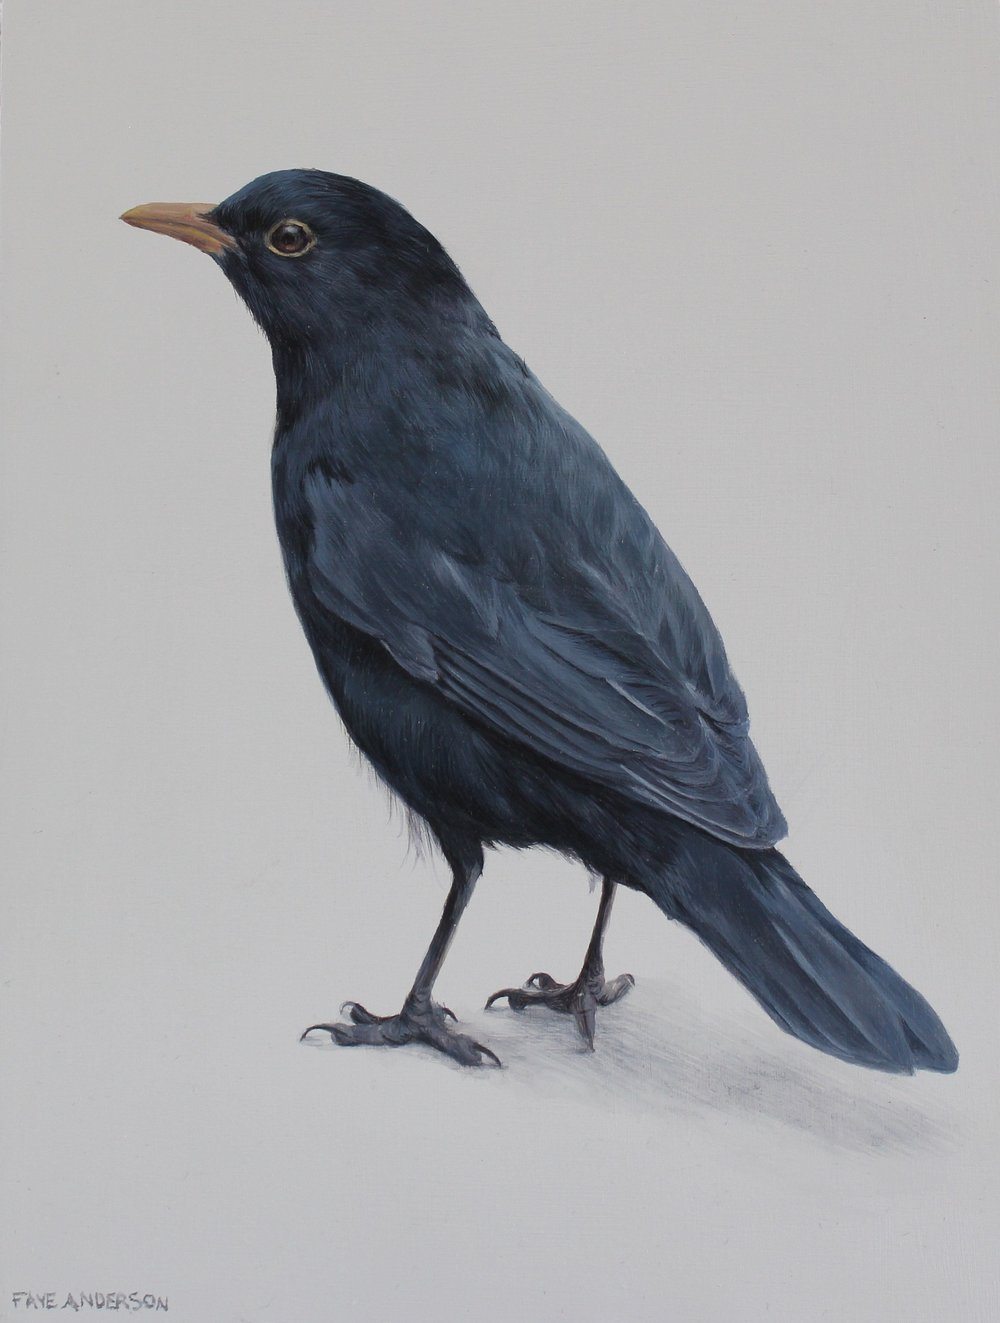 Artist: Faye Anderson  Title: Little Blackbird  Size: 20 x 15 cm  Price: SOLD